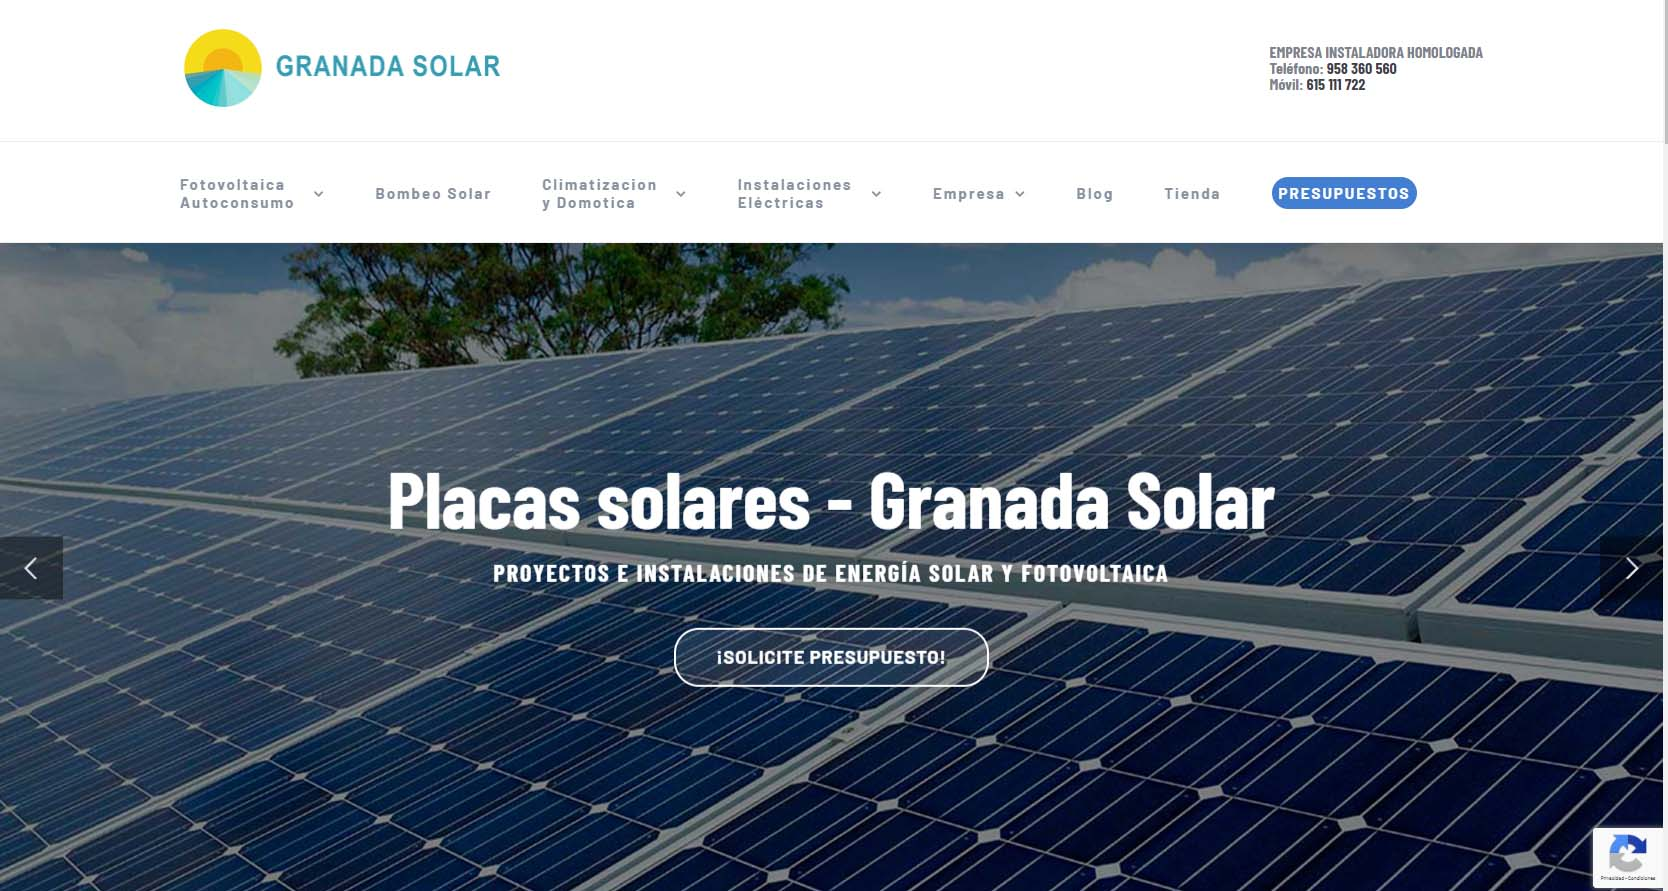 placas-solares-granada-malaga-almeria-jaen-cordoba.sevilla